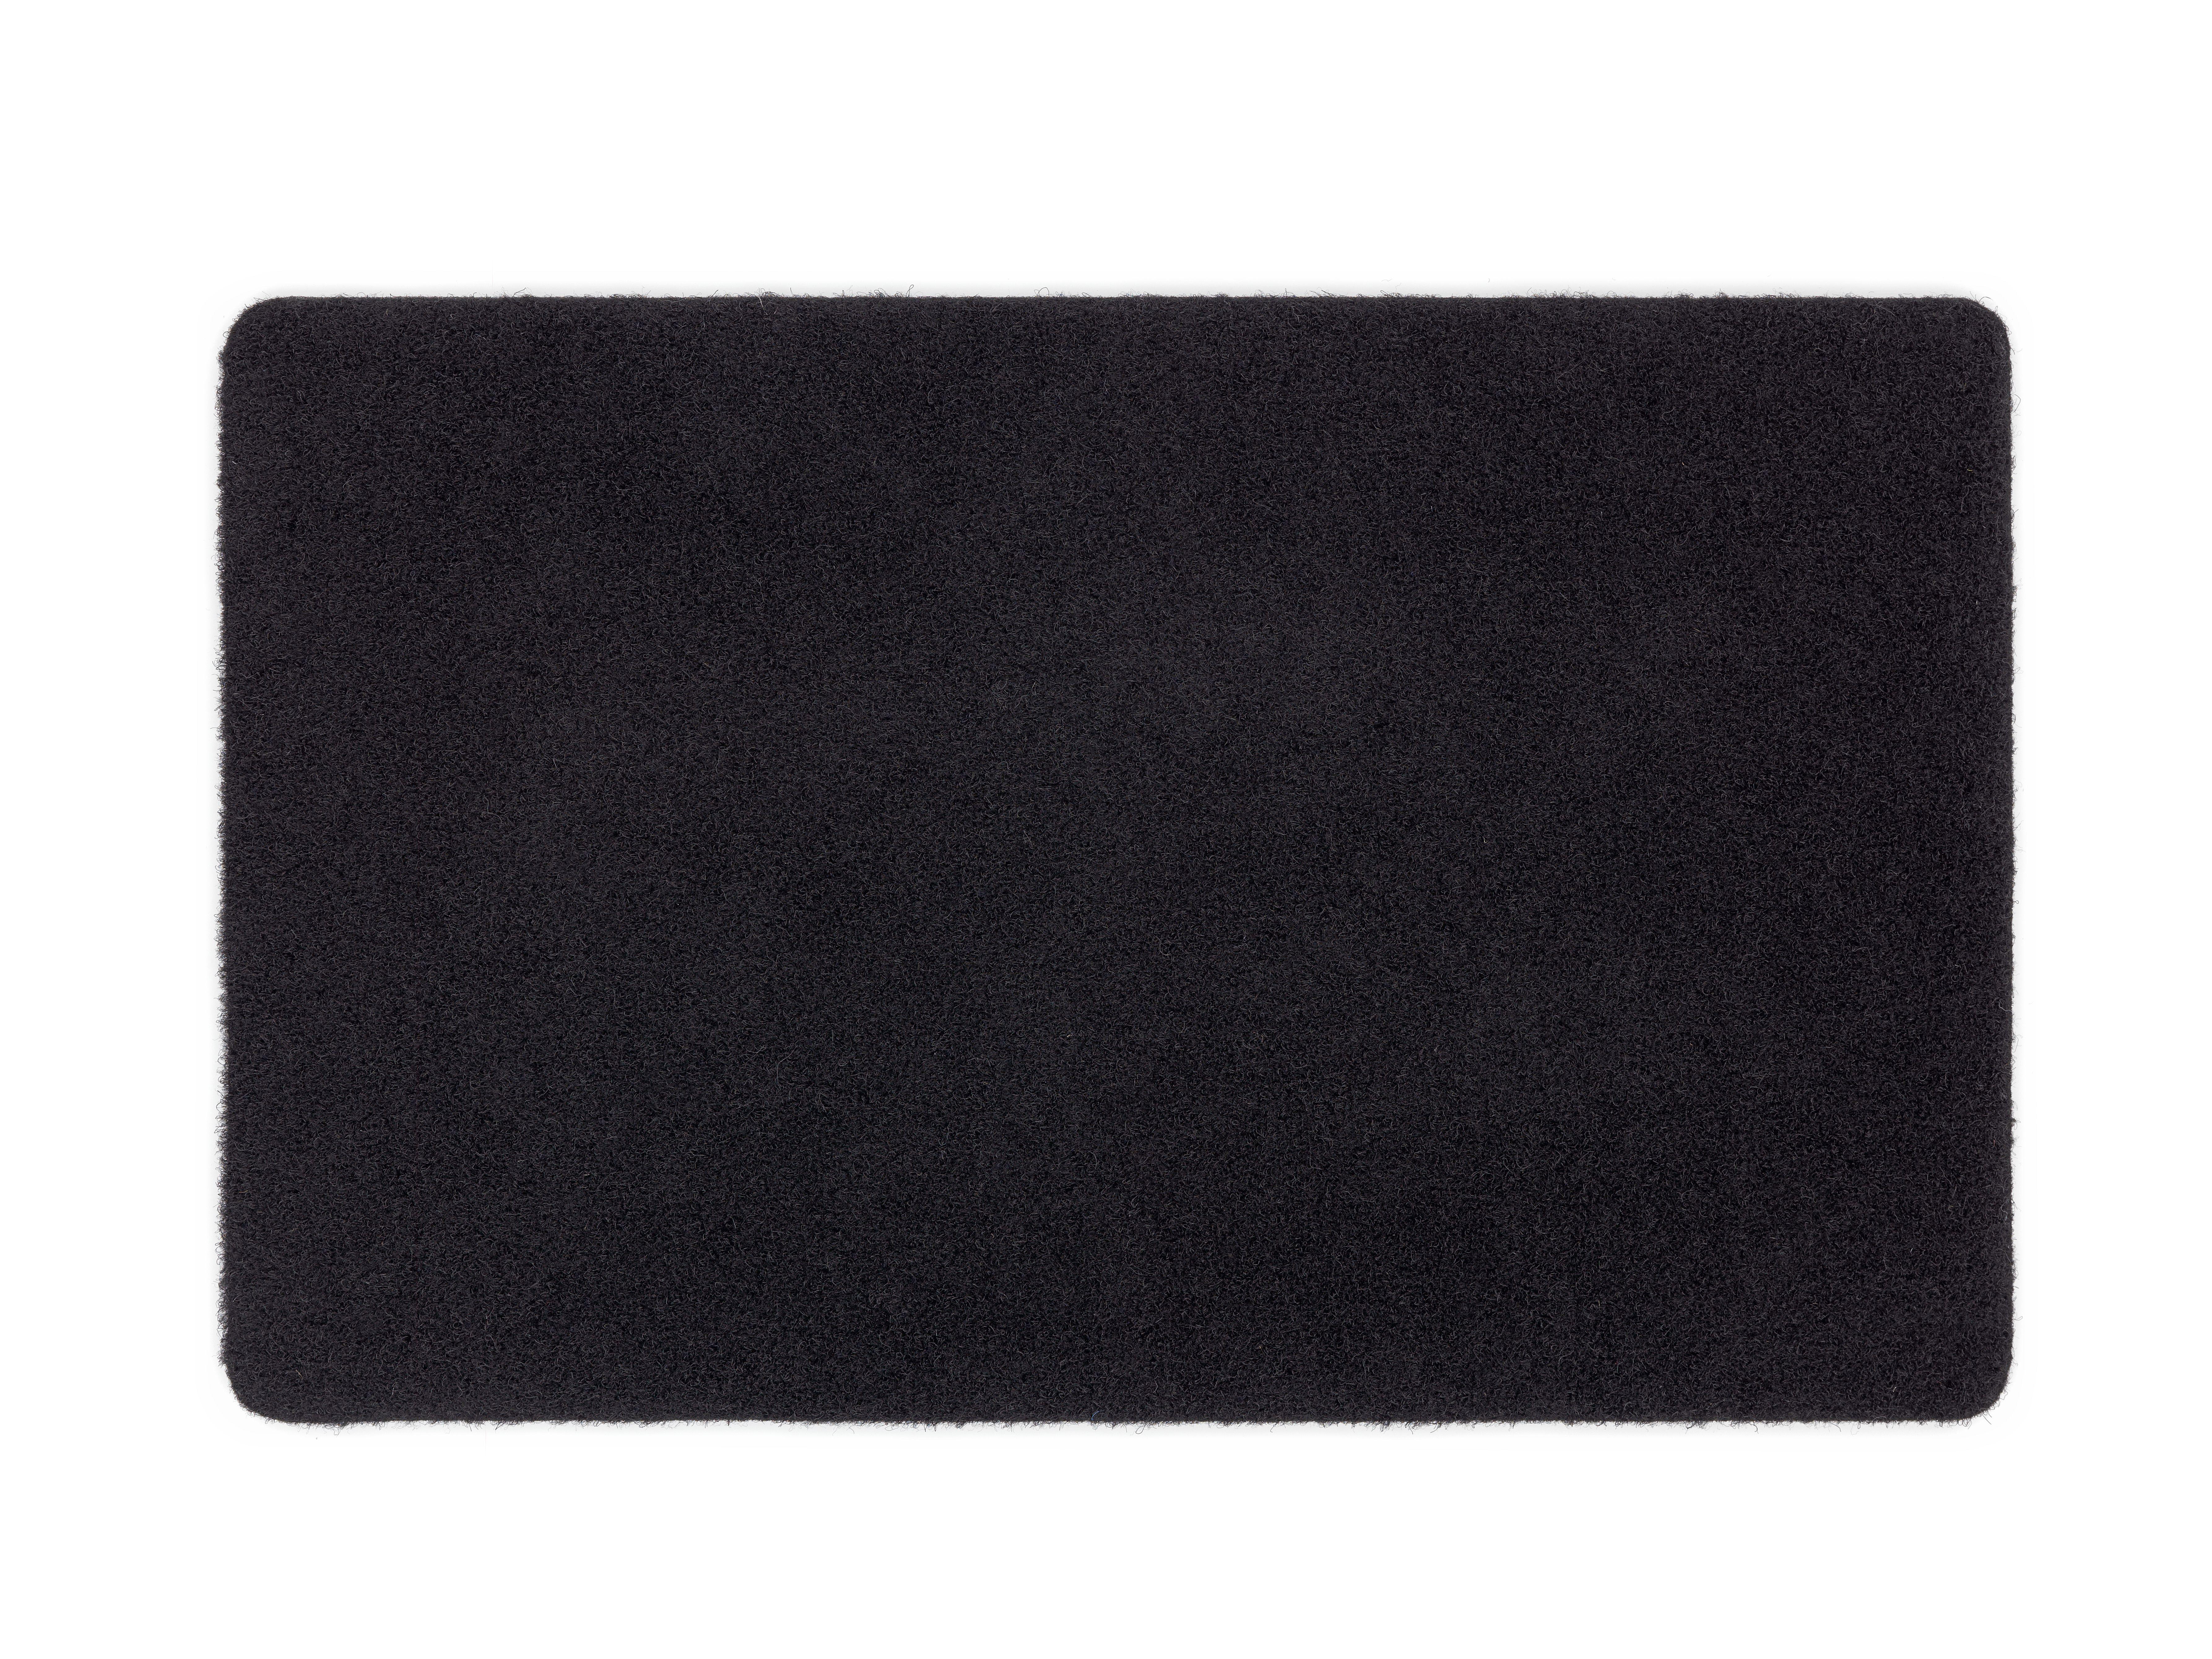 Fußmatte Power Rib (Schwarz; 40 x 60 cm)